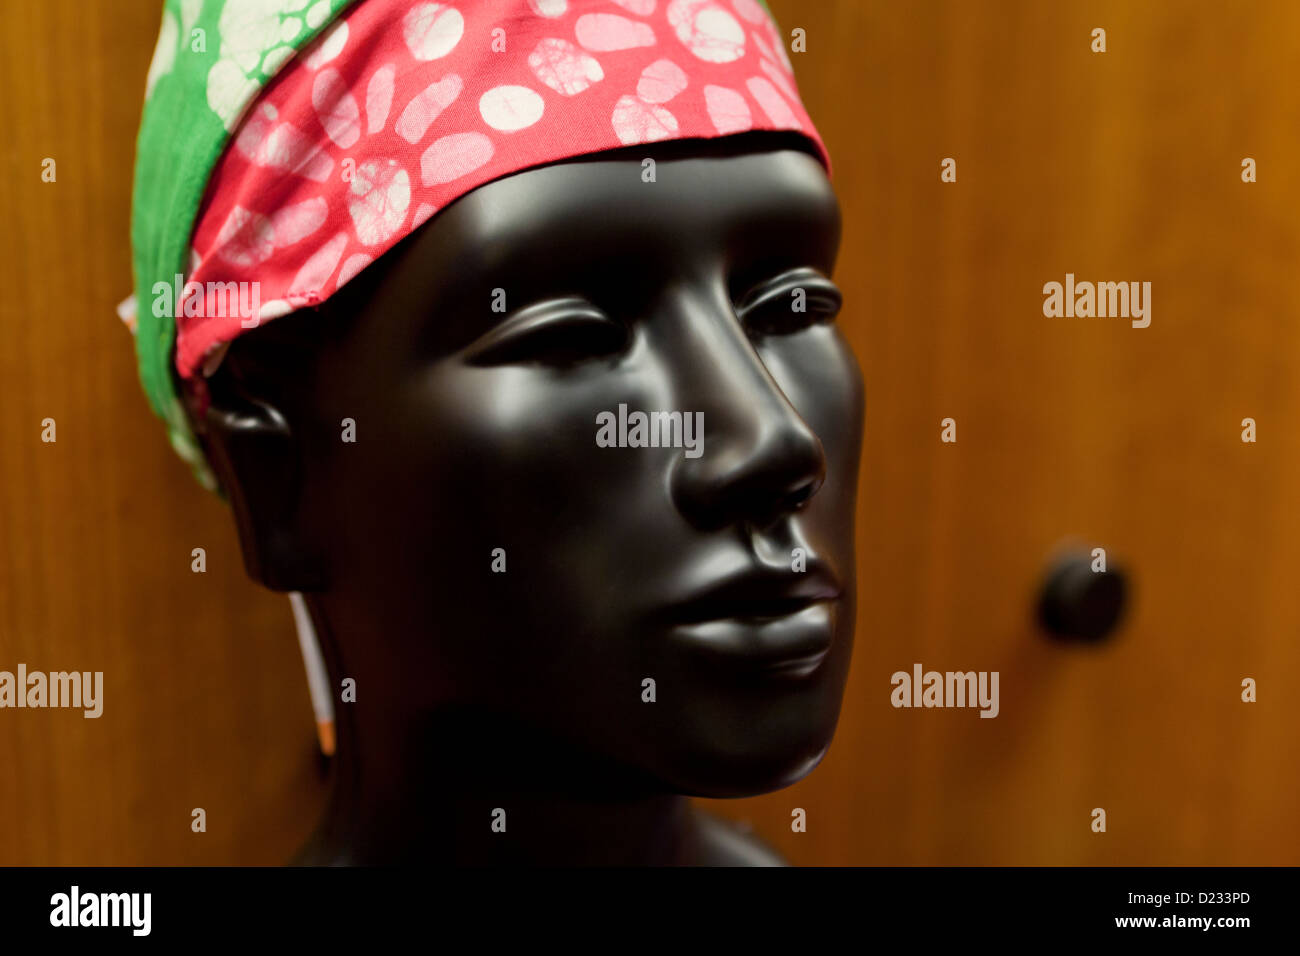 Black mannequin head - Stock Image